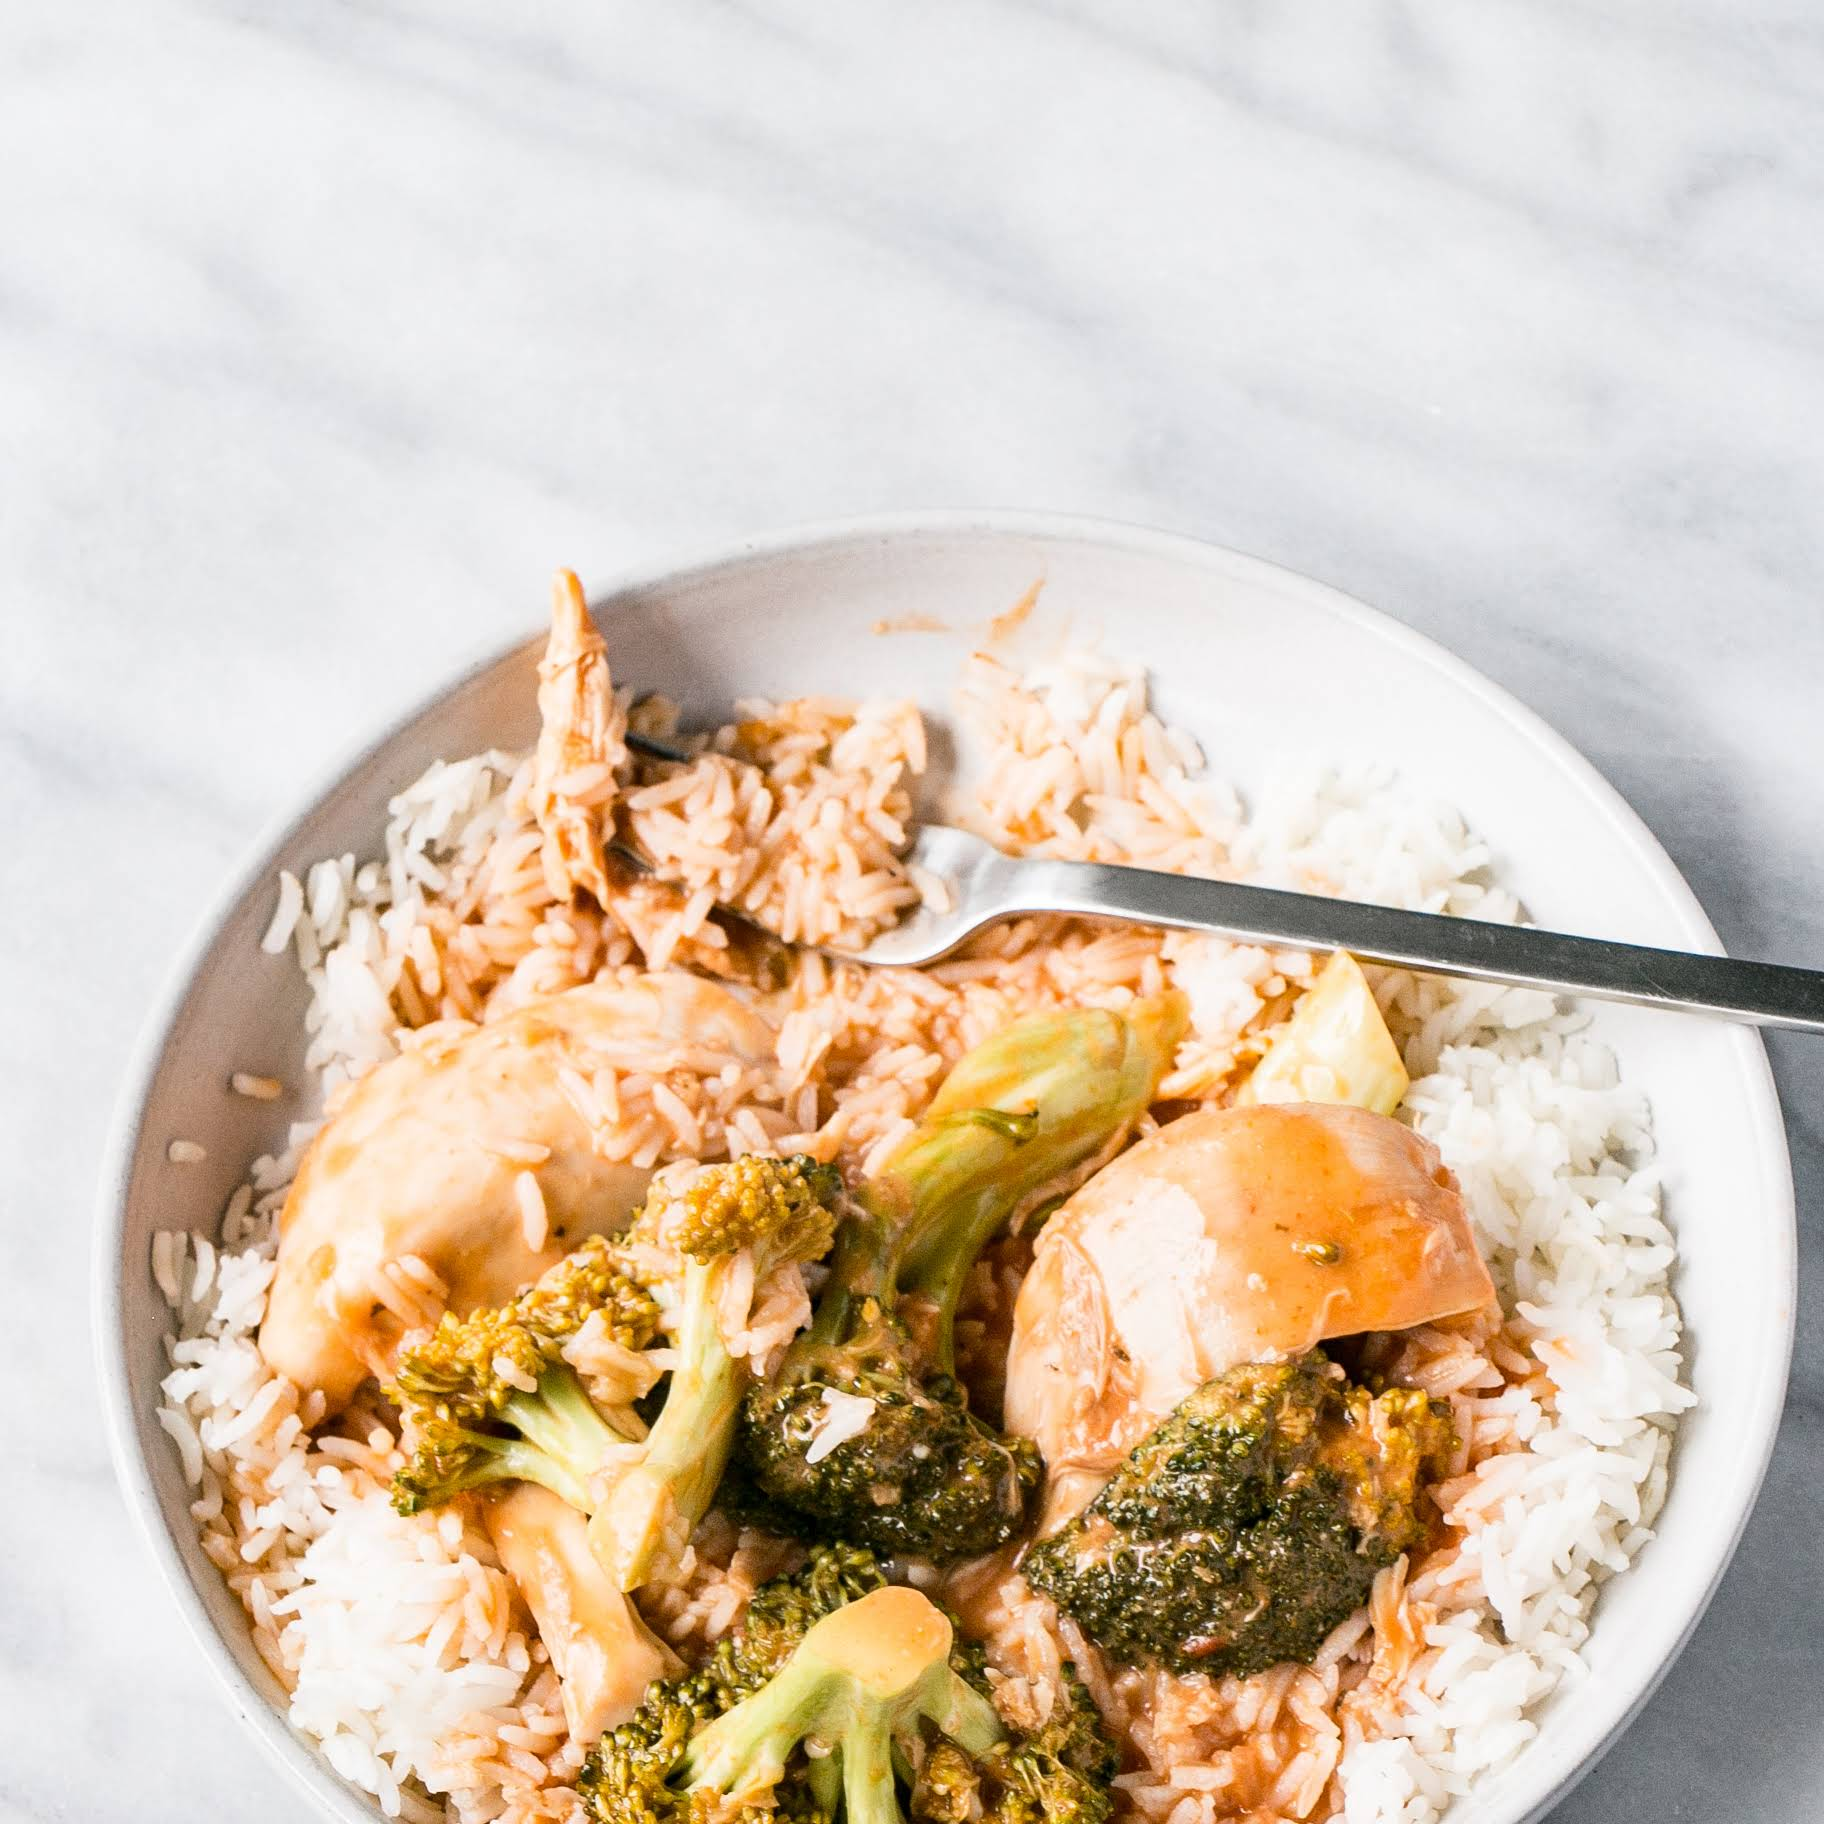 Slow Cooker Thai Tomato Chicken and Broccoli